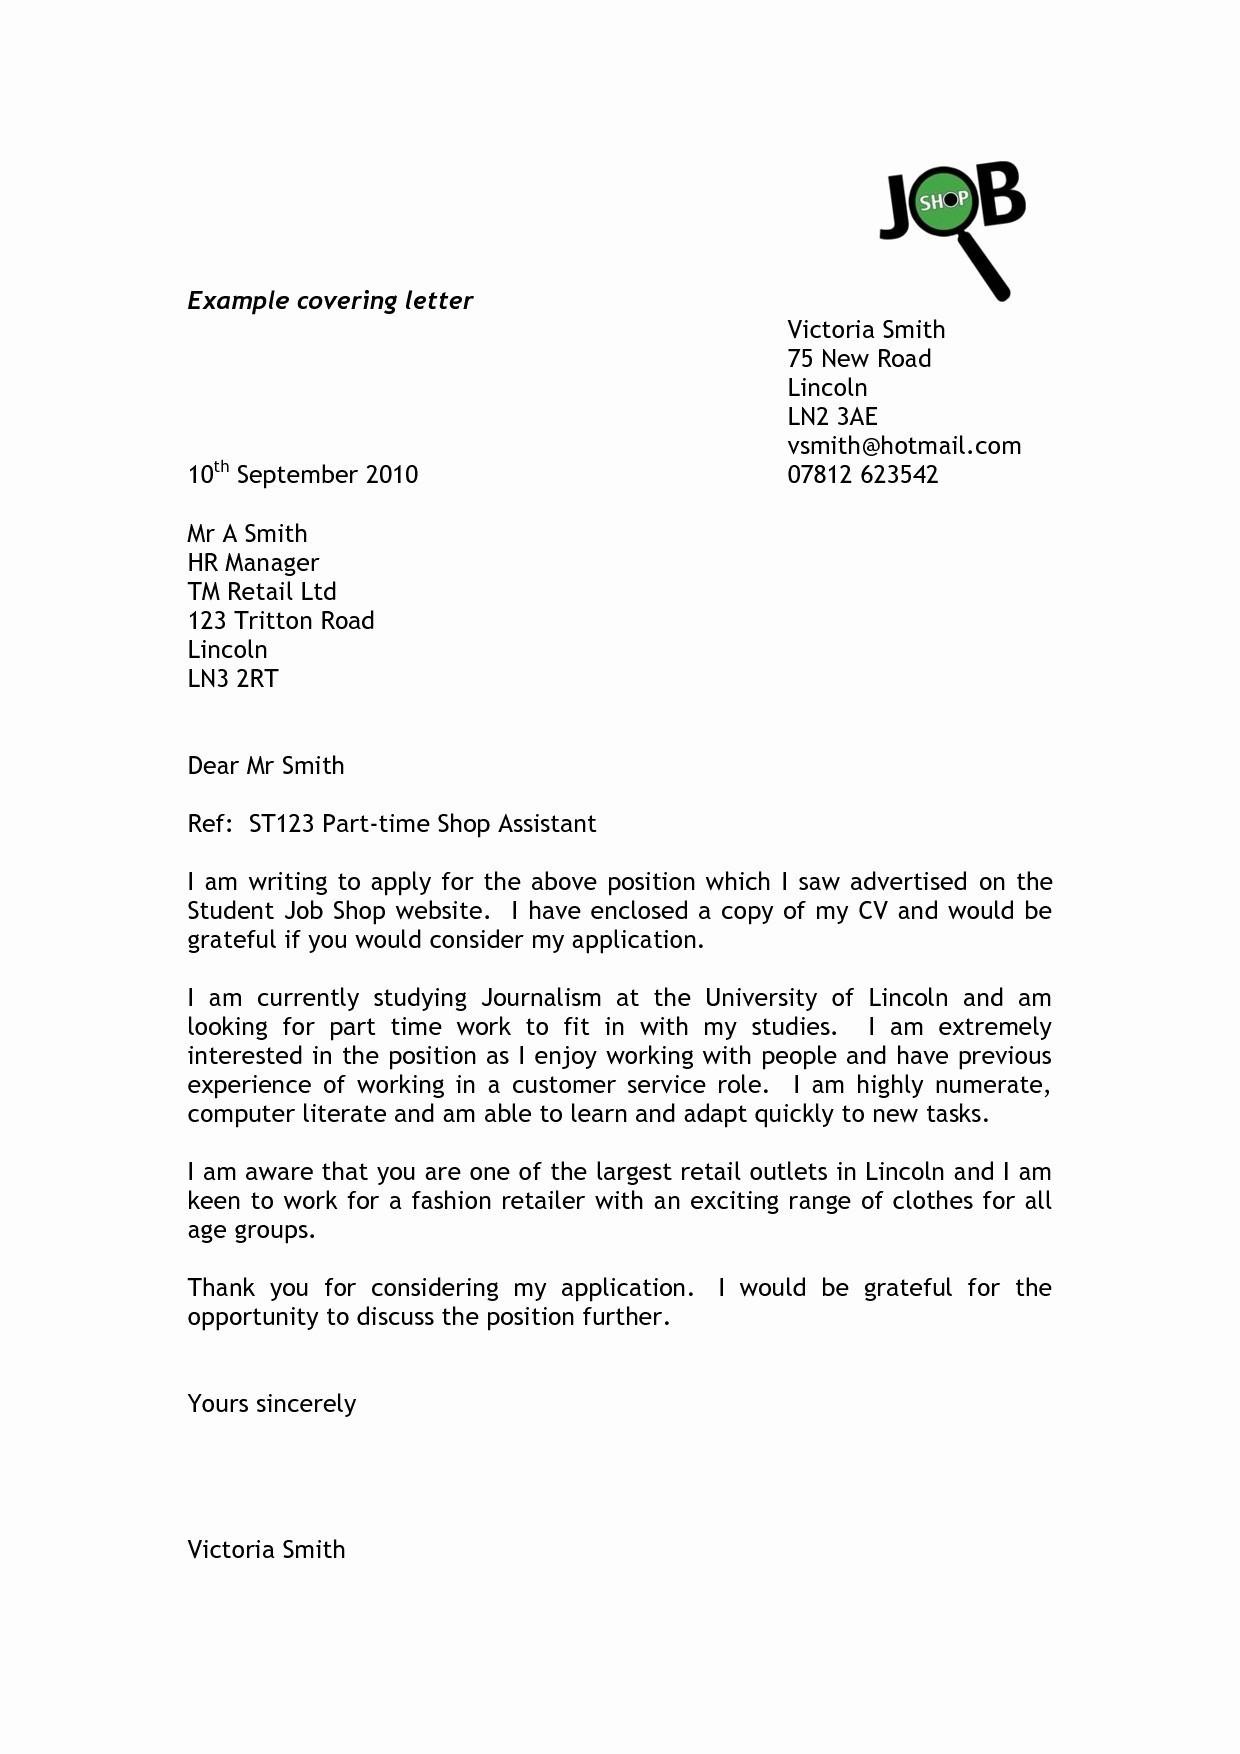 Job Application Cover Letter Template Word - format Covering Letter for Cv